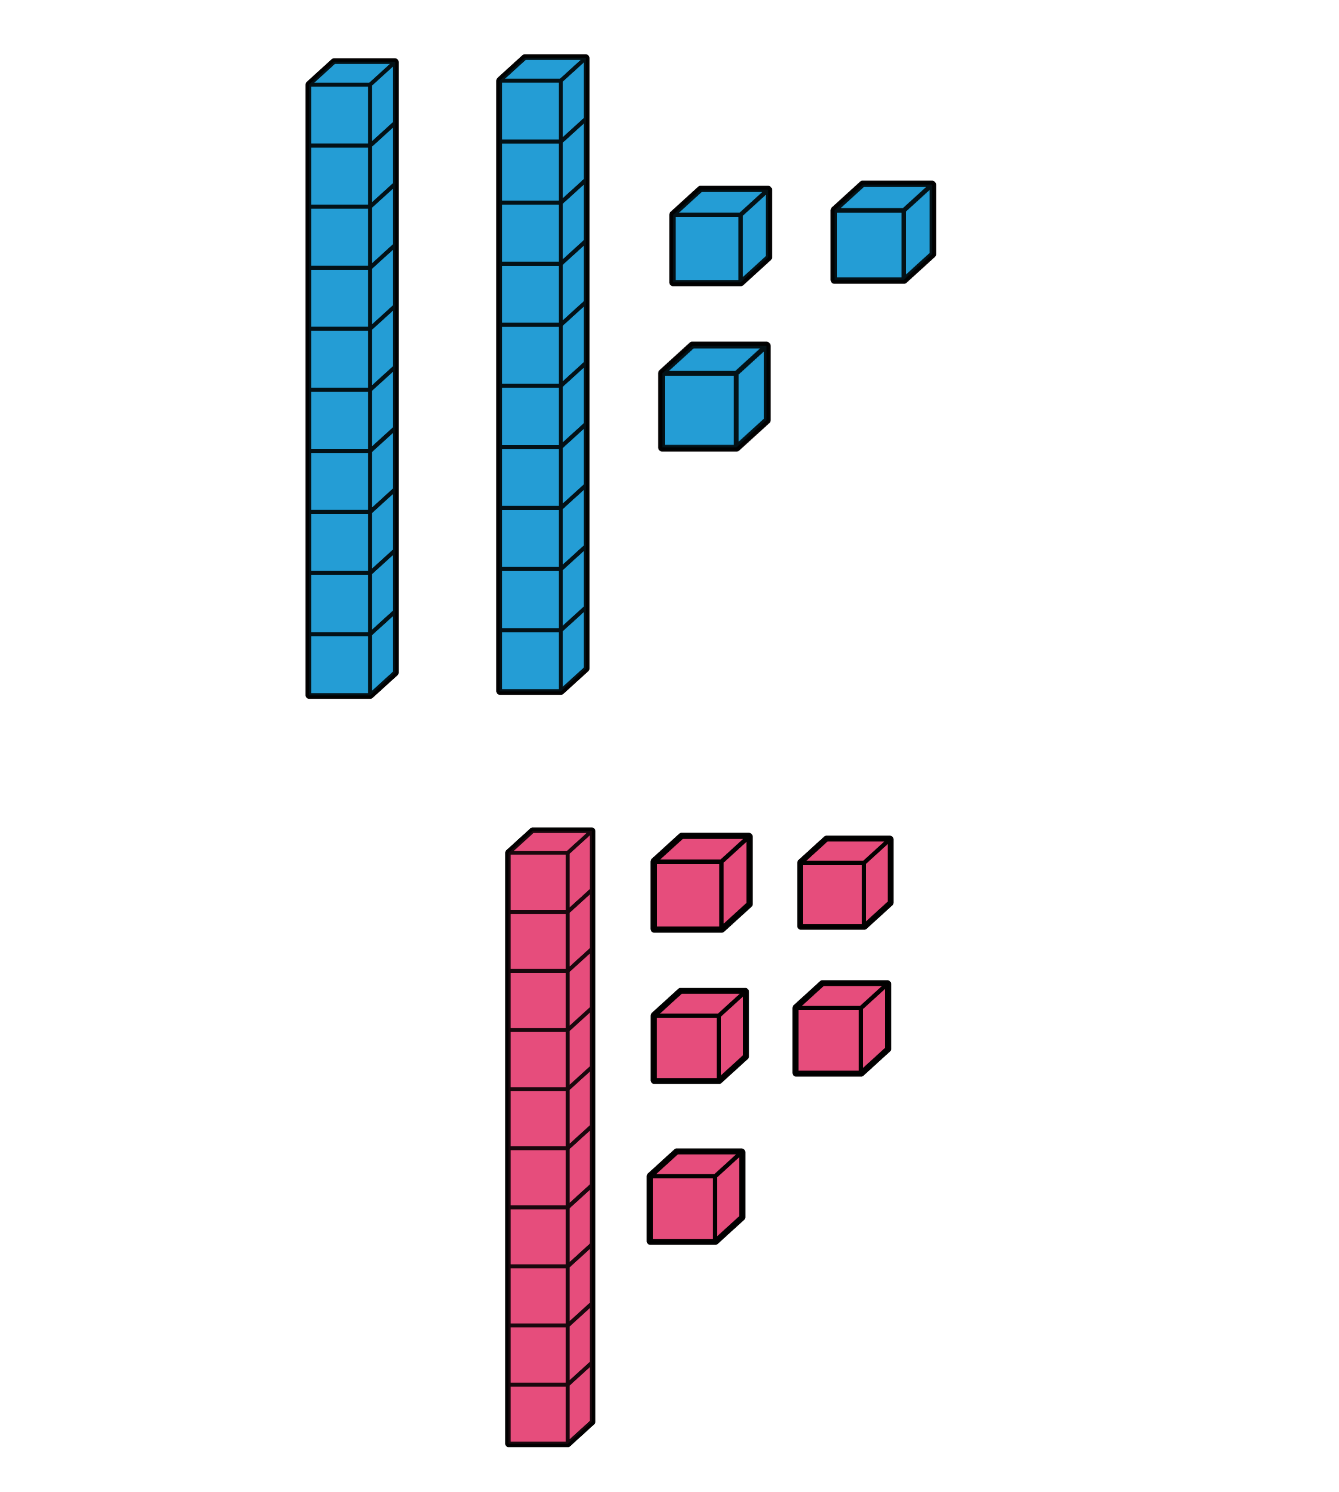 Hands on math teaching. Cube clipart unifex